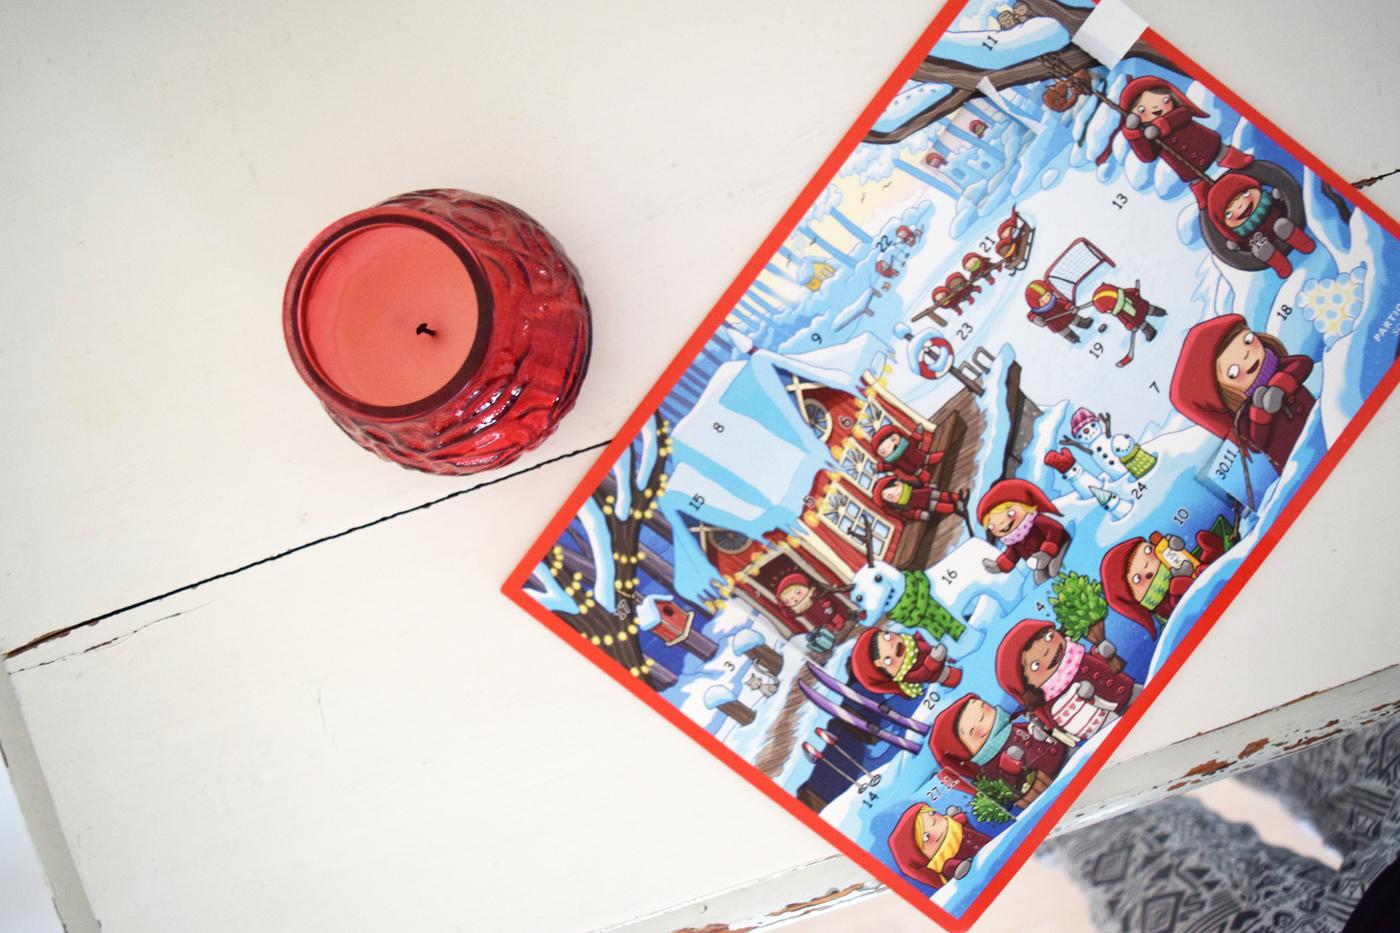 joulukalenteri3.jpg